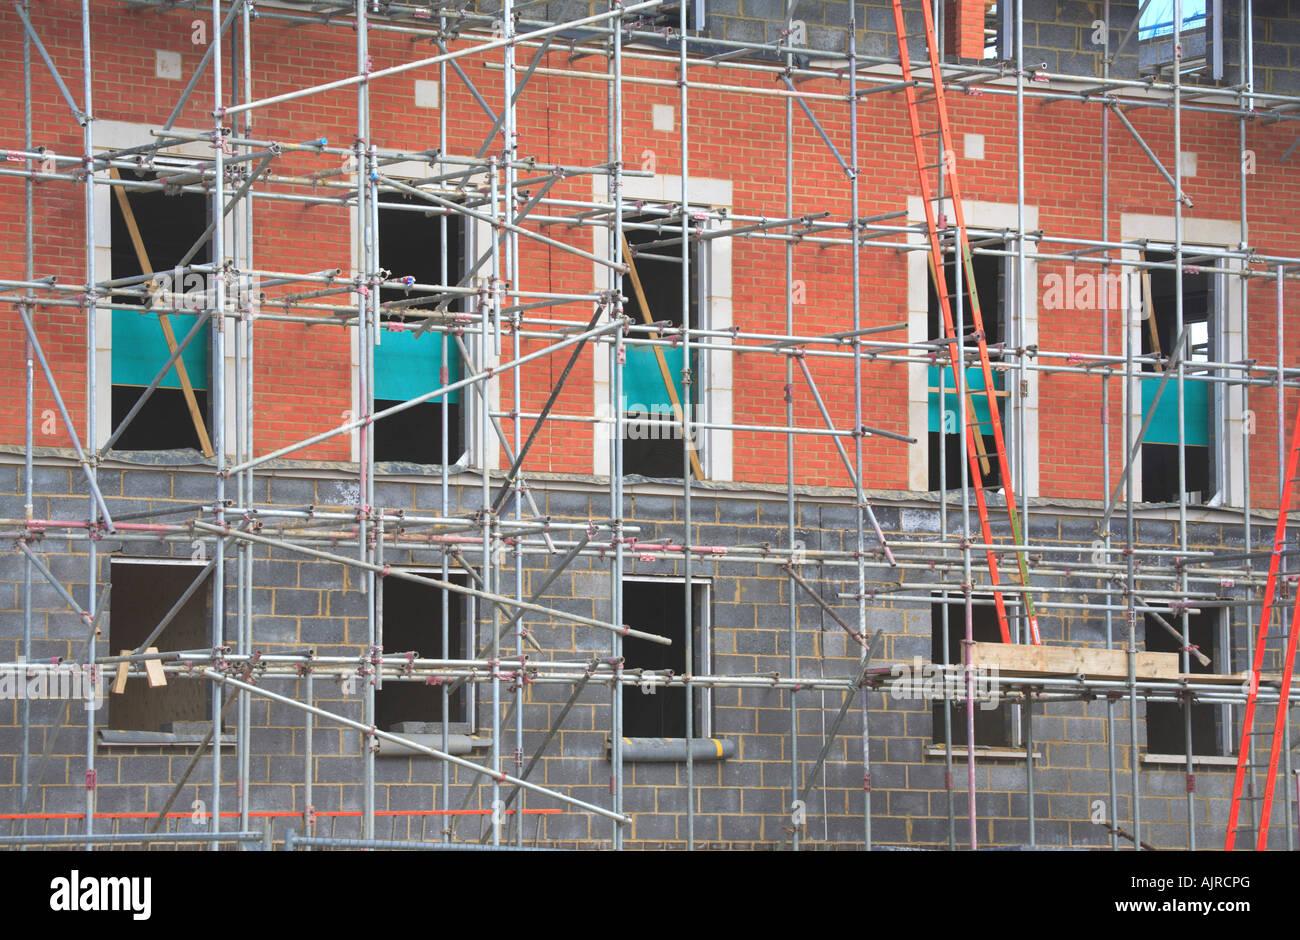 scaffold scaffolding safe ladder building build red brick security scaffold scaffolding safe ladder building build red brick security pipes poles house property